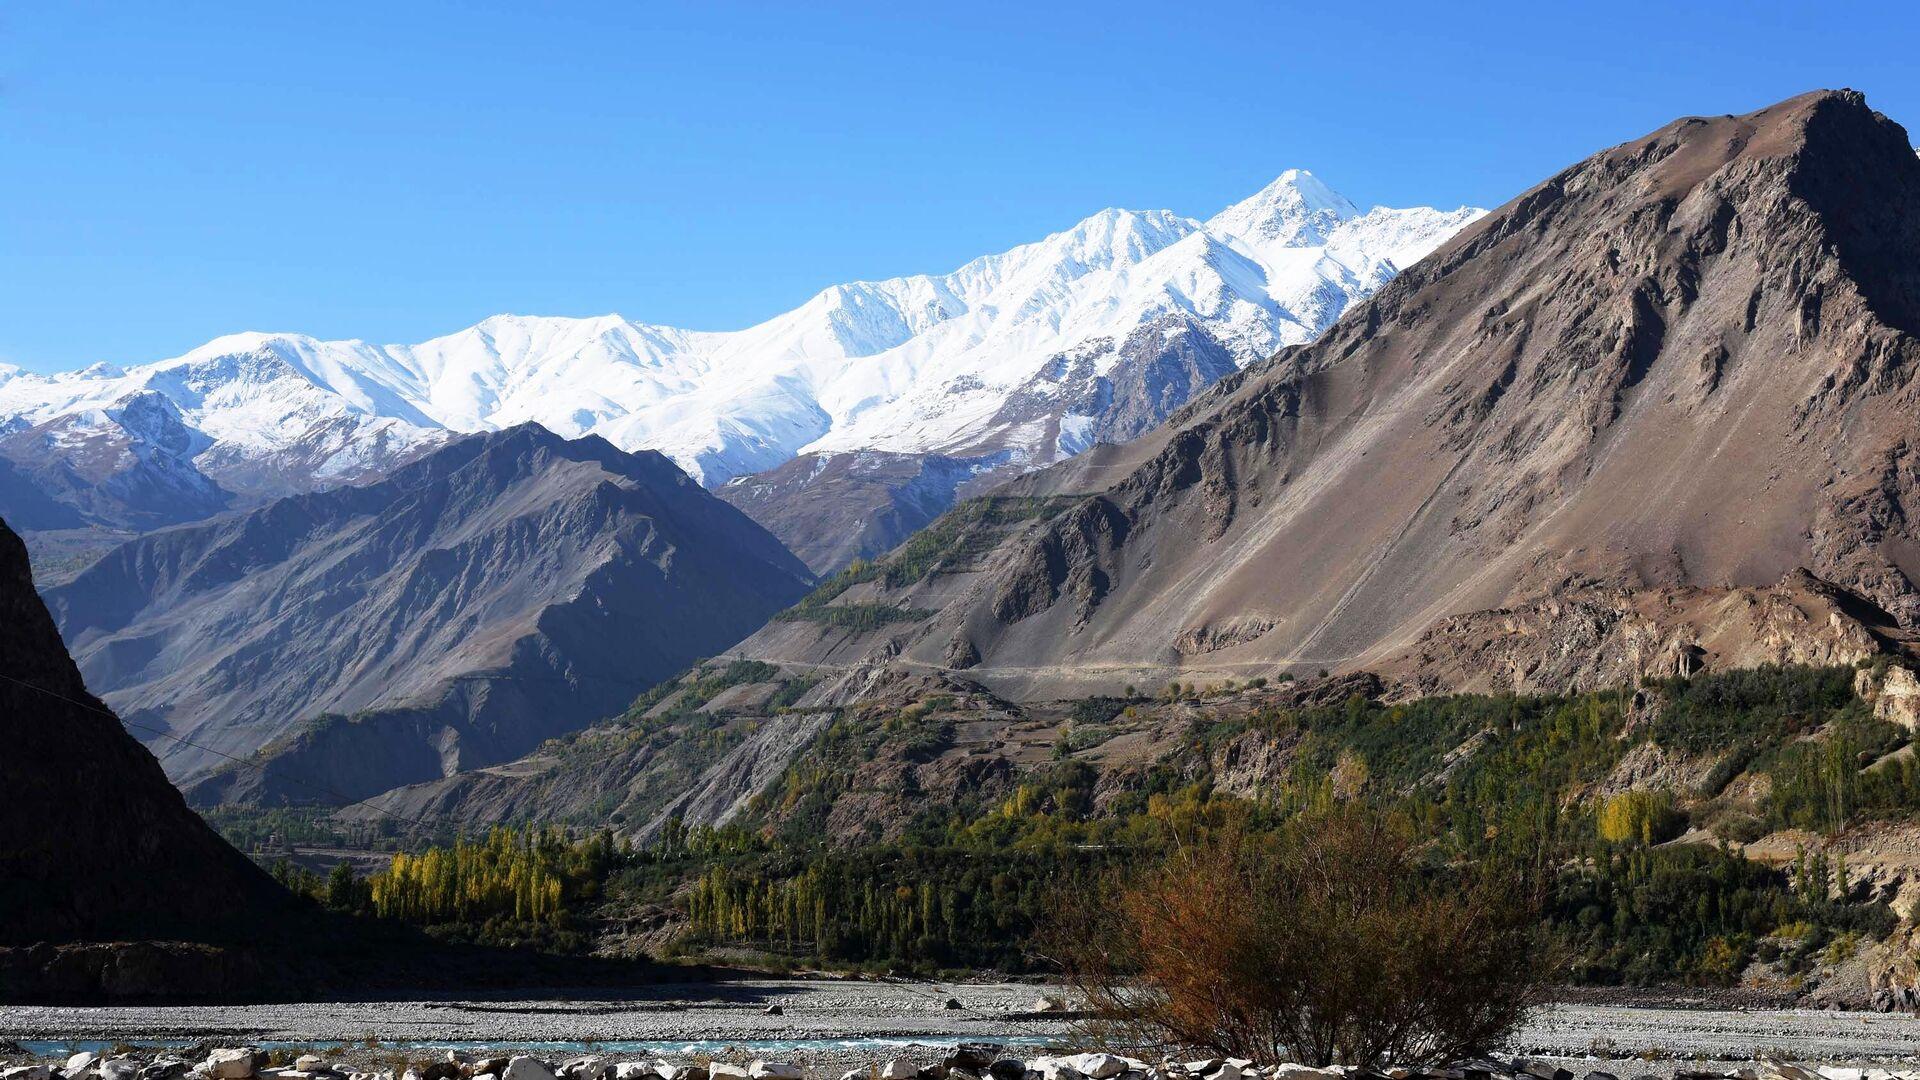 Tadschikisch-afghanische Grenze entlang des Flusses Pamir (Archiv) - SNA, 1920, 05.07.2021